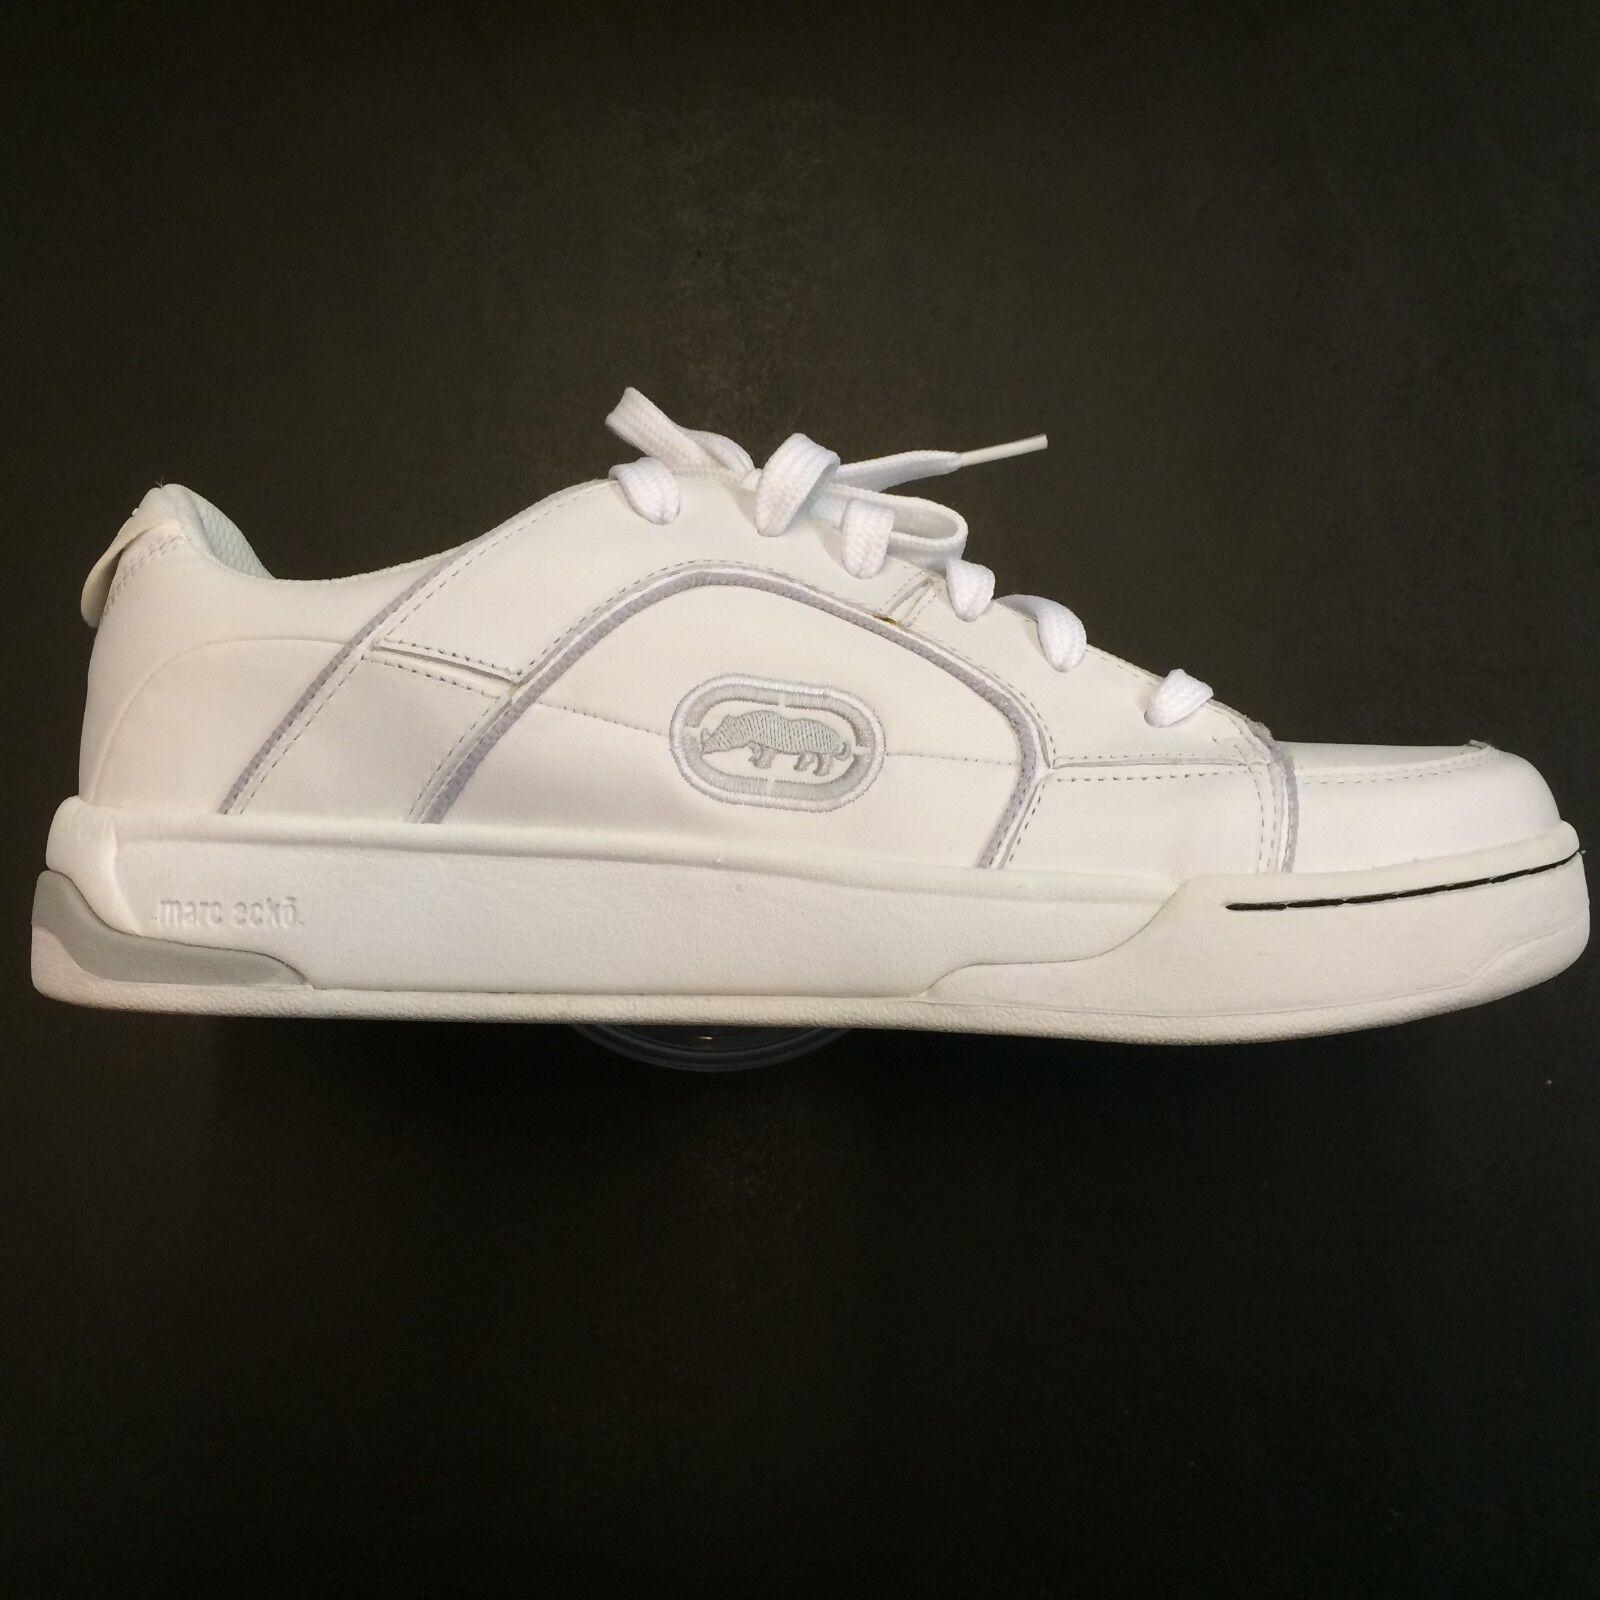 Uomo Brand New New New Ecko Unltd  biancaHALL  scarpe, 24004 7d26ae